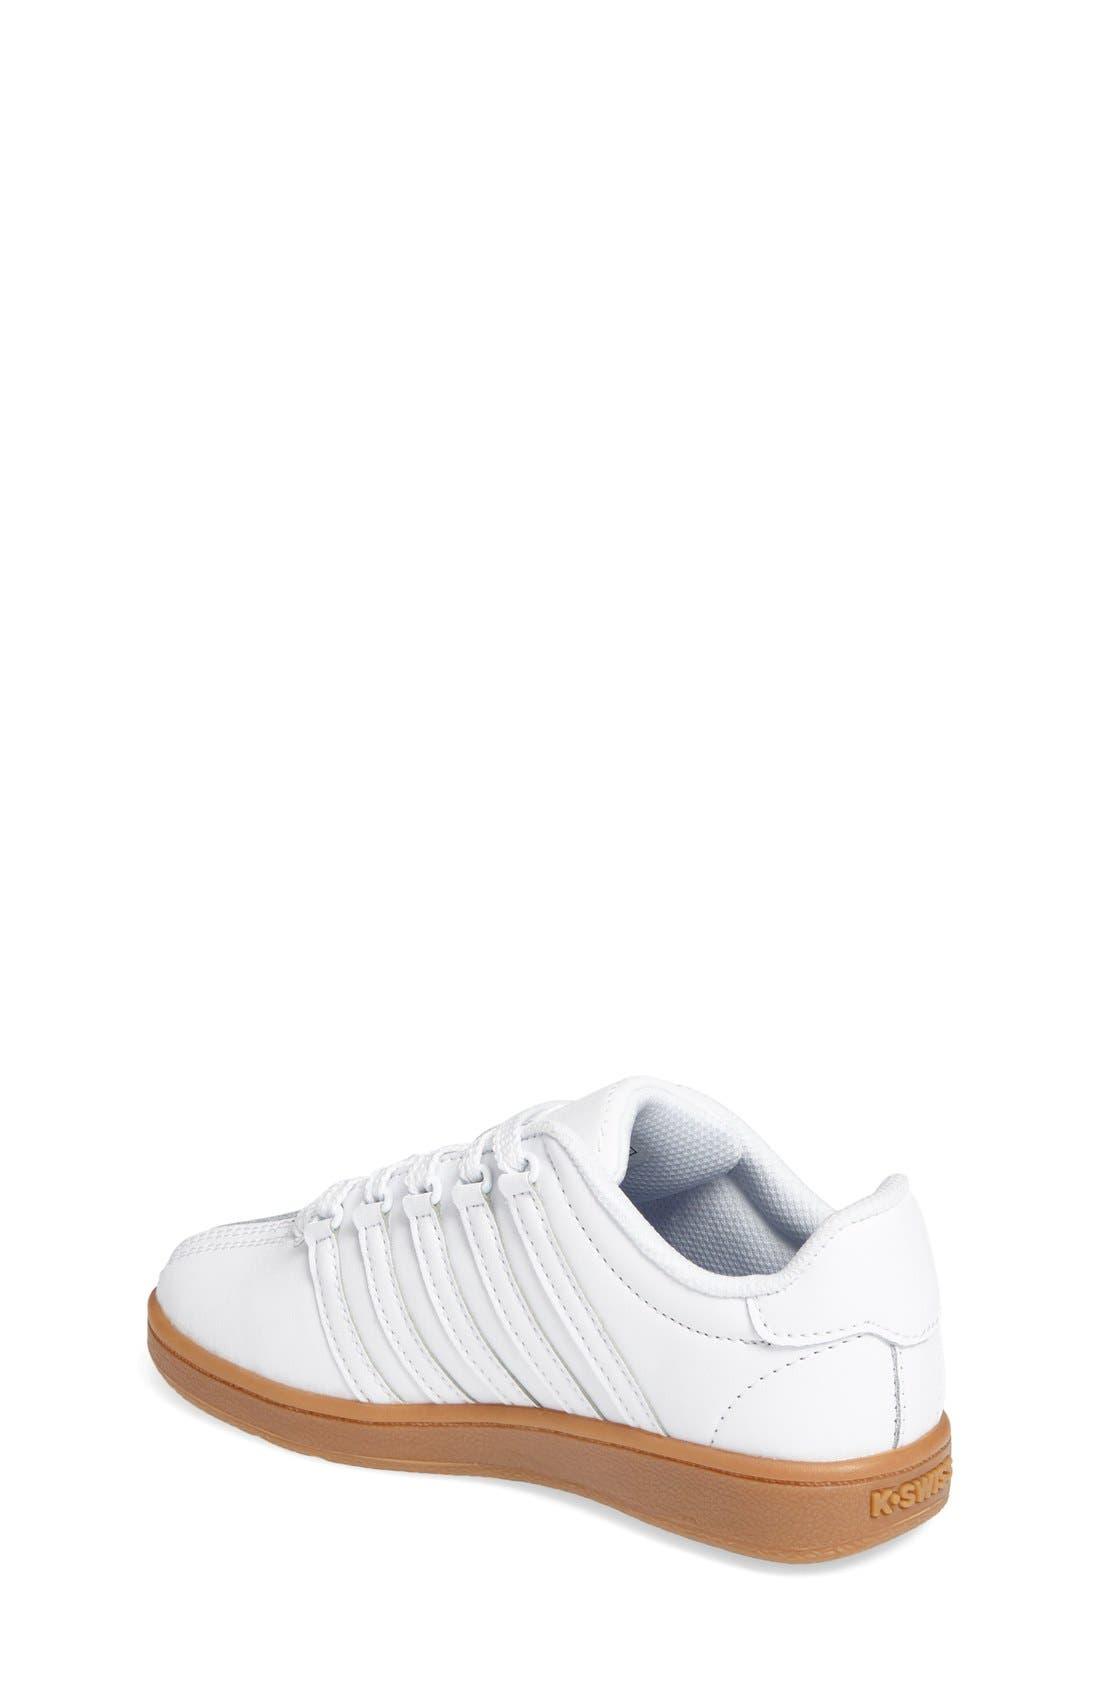 'Classic' Sneaker,                             Alternate thumbnail 14, color,